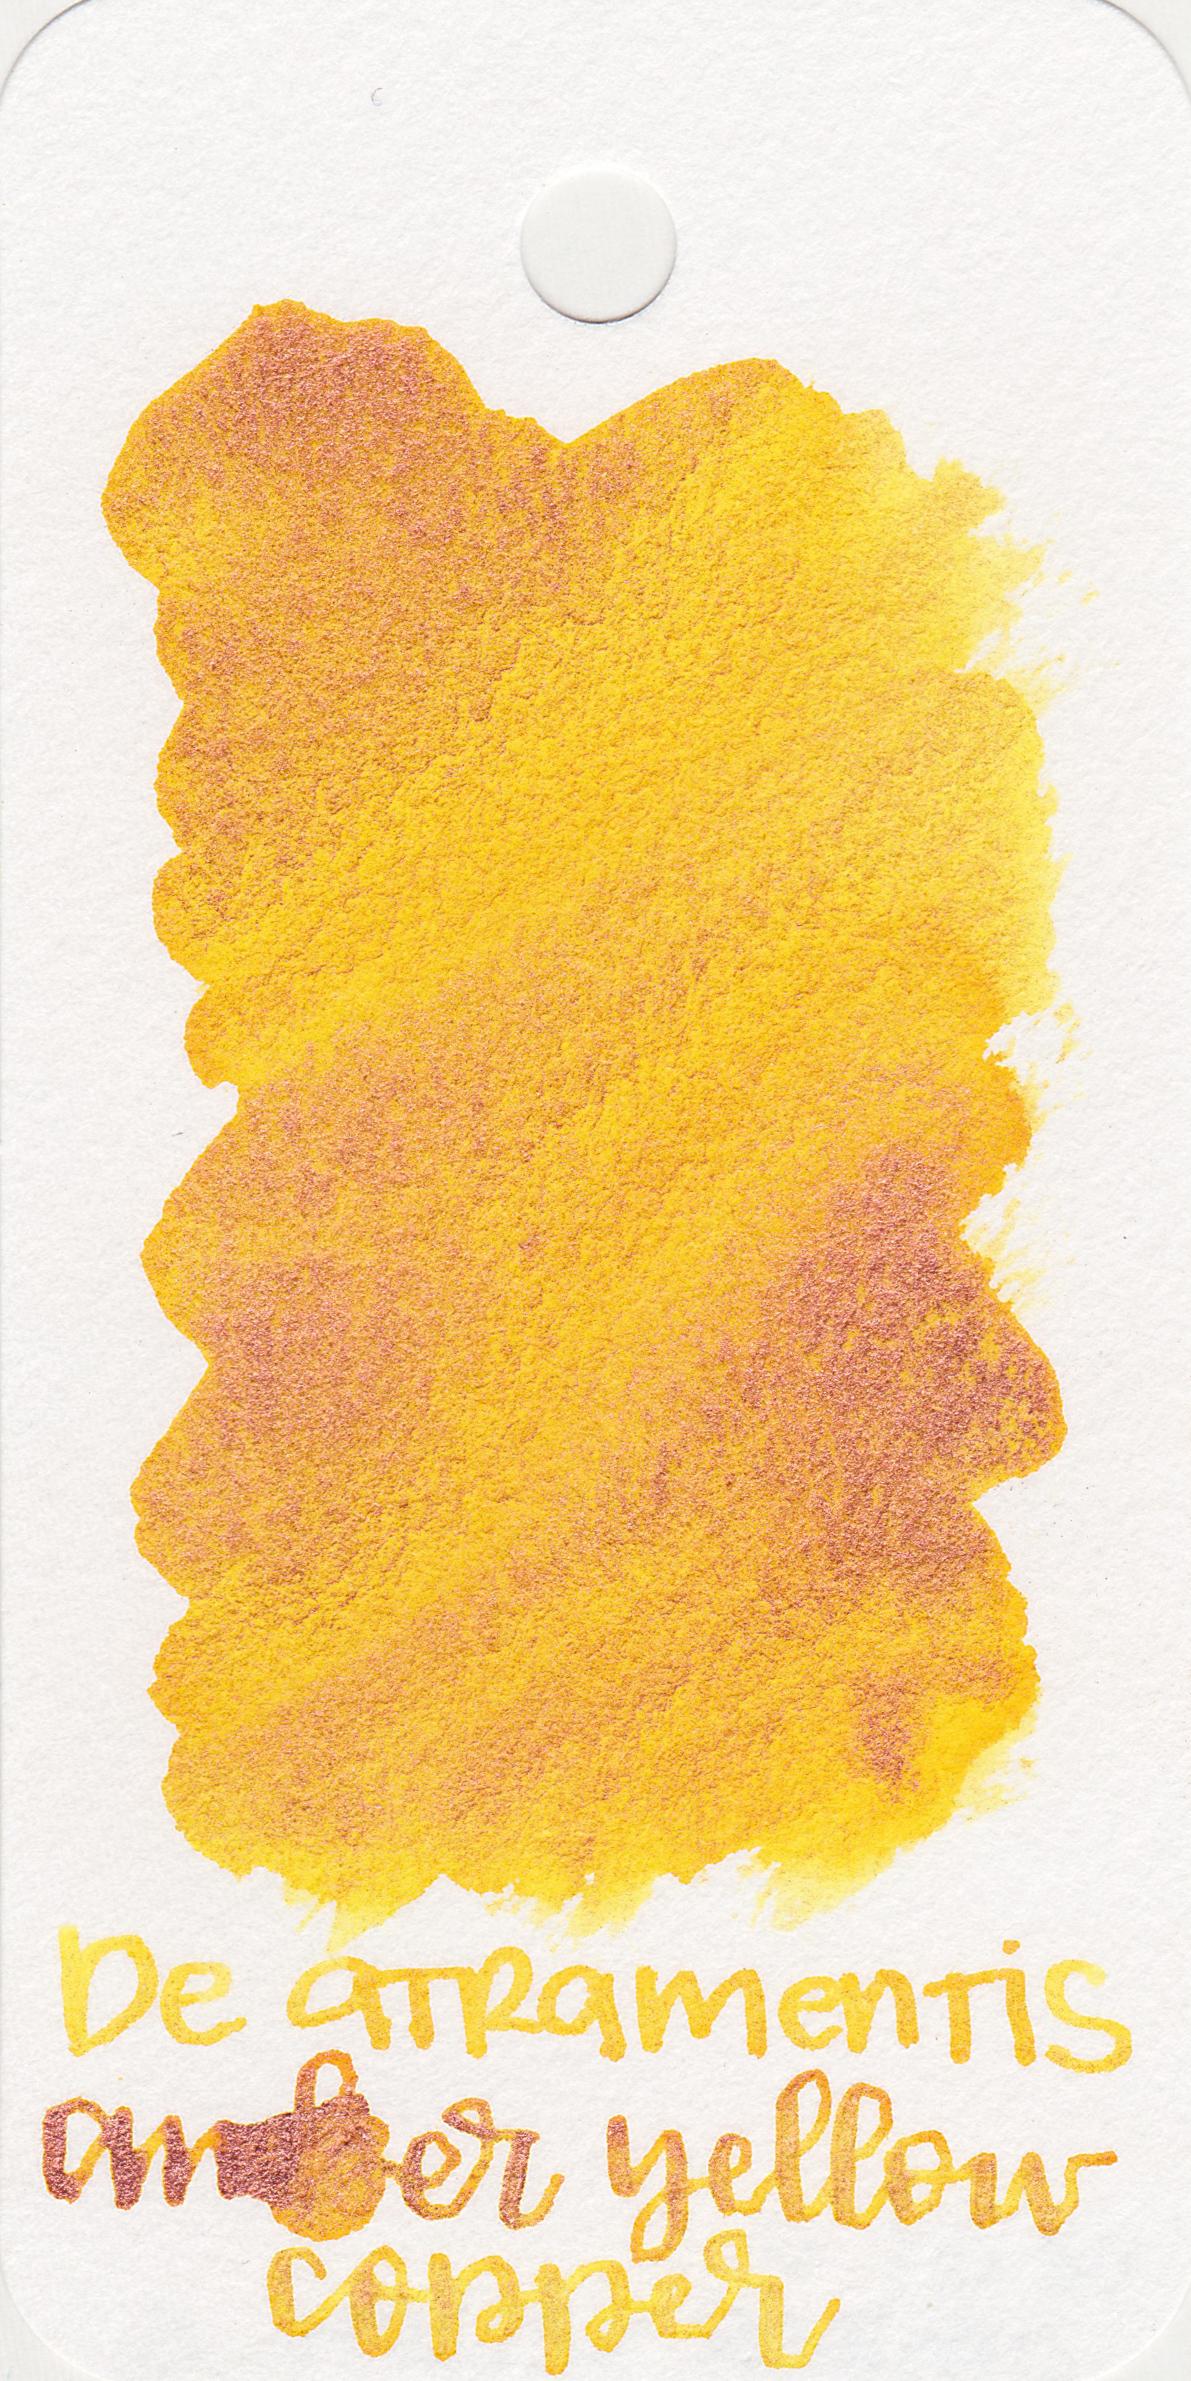 da-amber-yellow-copper-1.jpg